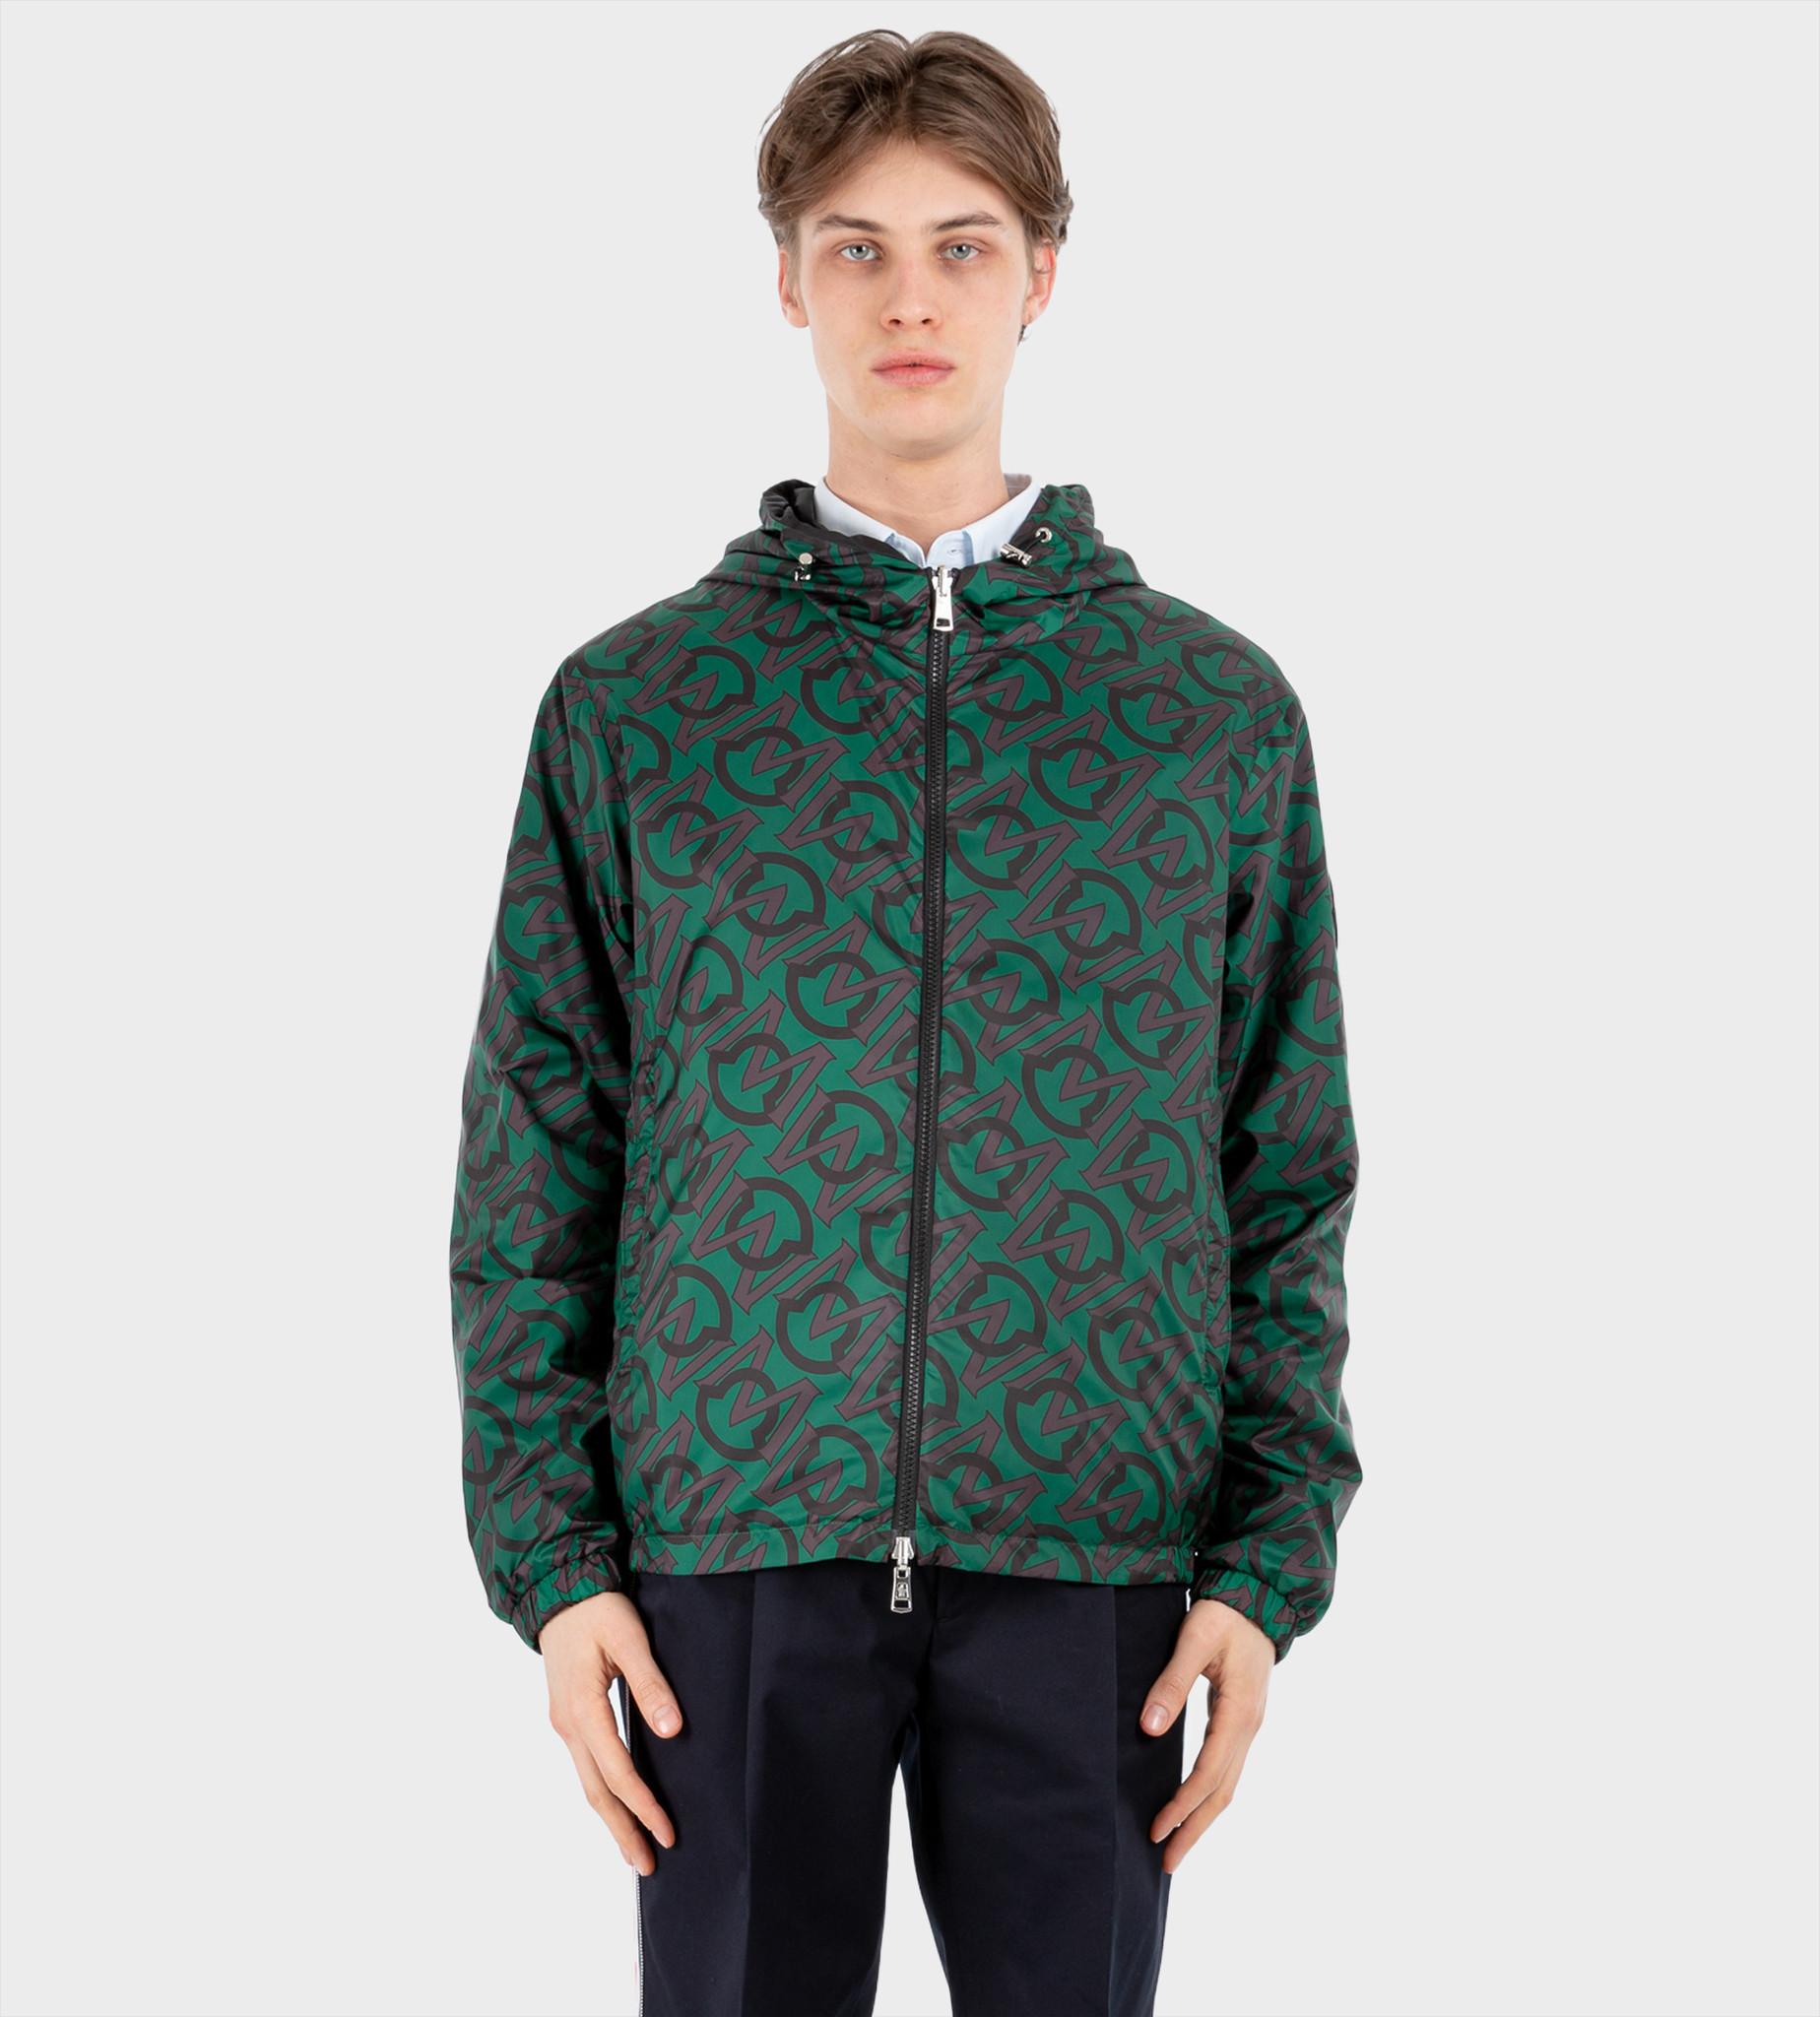 MONCLER Cretes Reversible Jacket With Logo Green